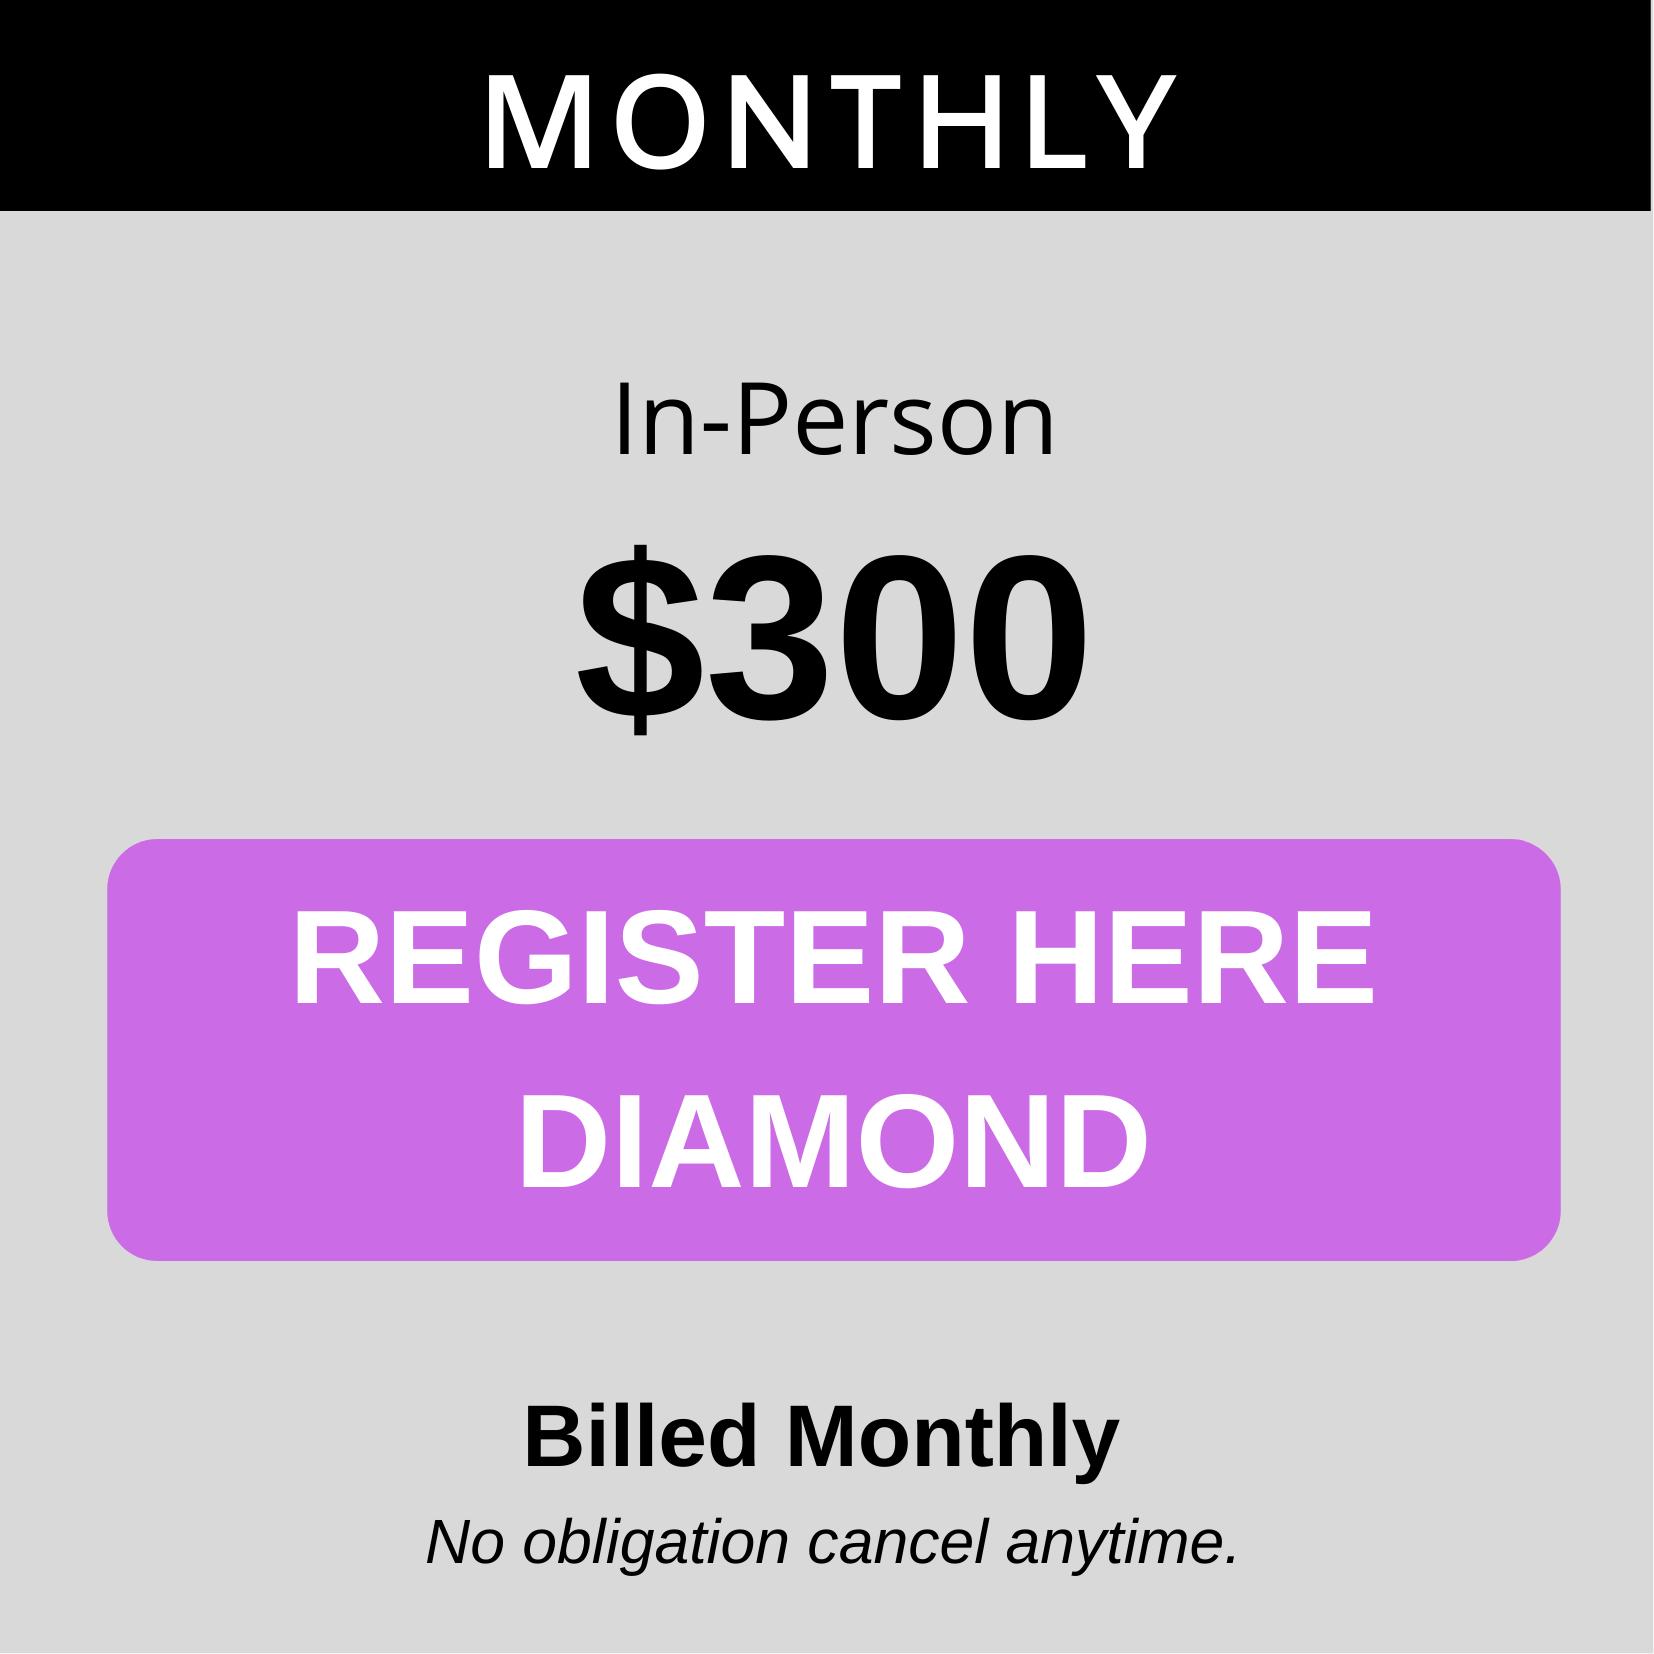 Diamond Monthly inperson